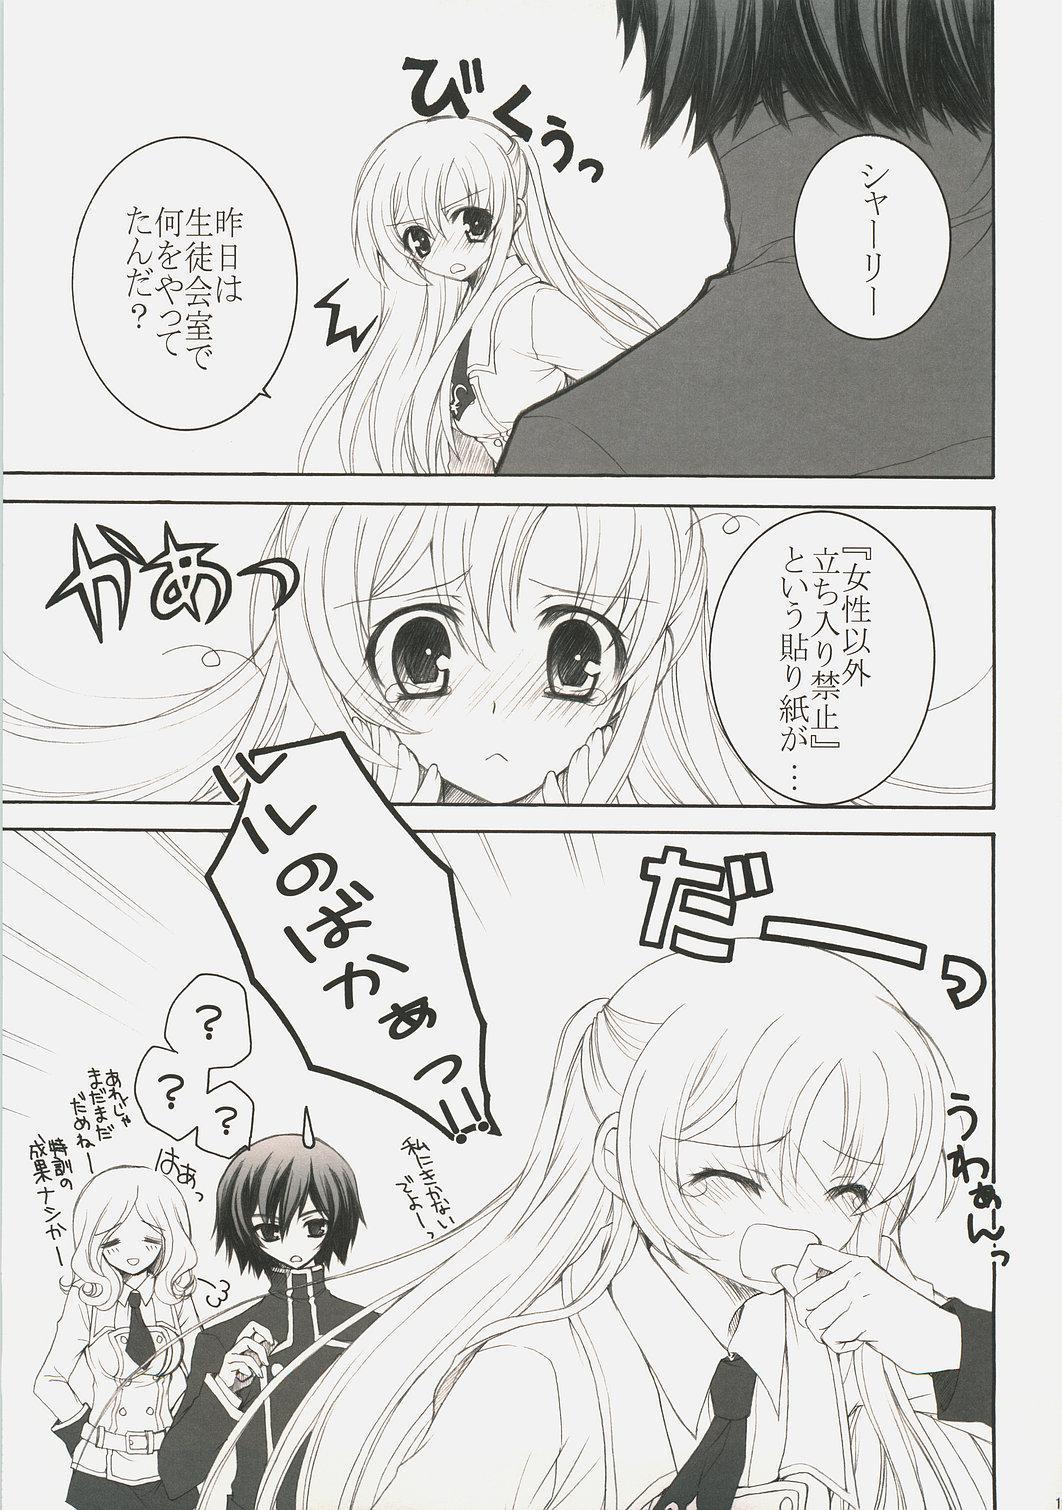 Youkoso, Ura Seitokai e! 17